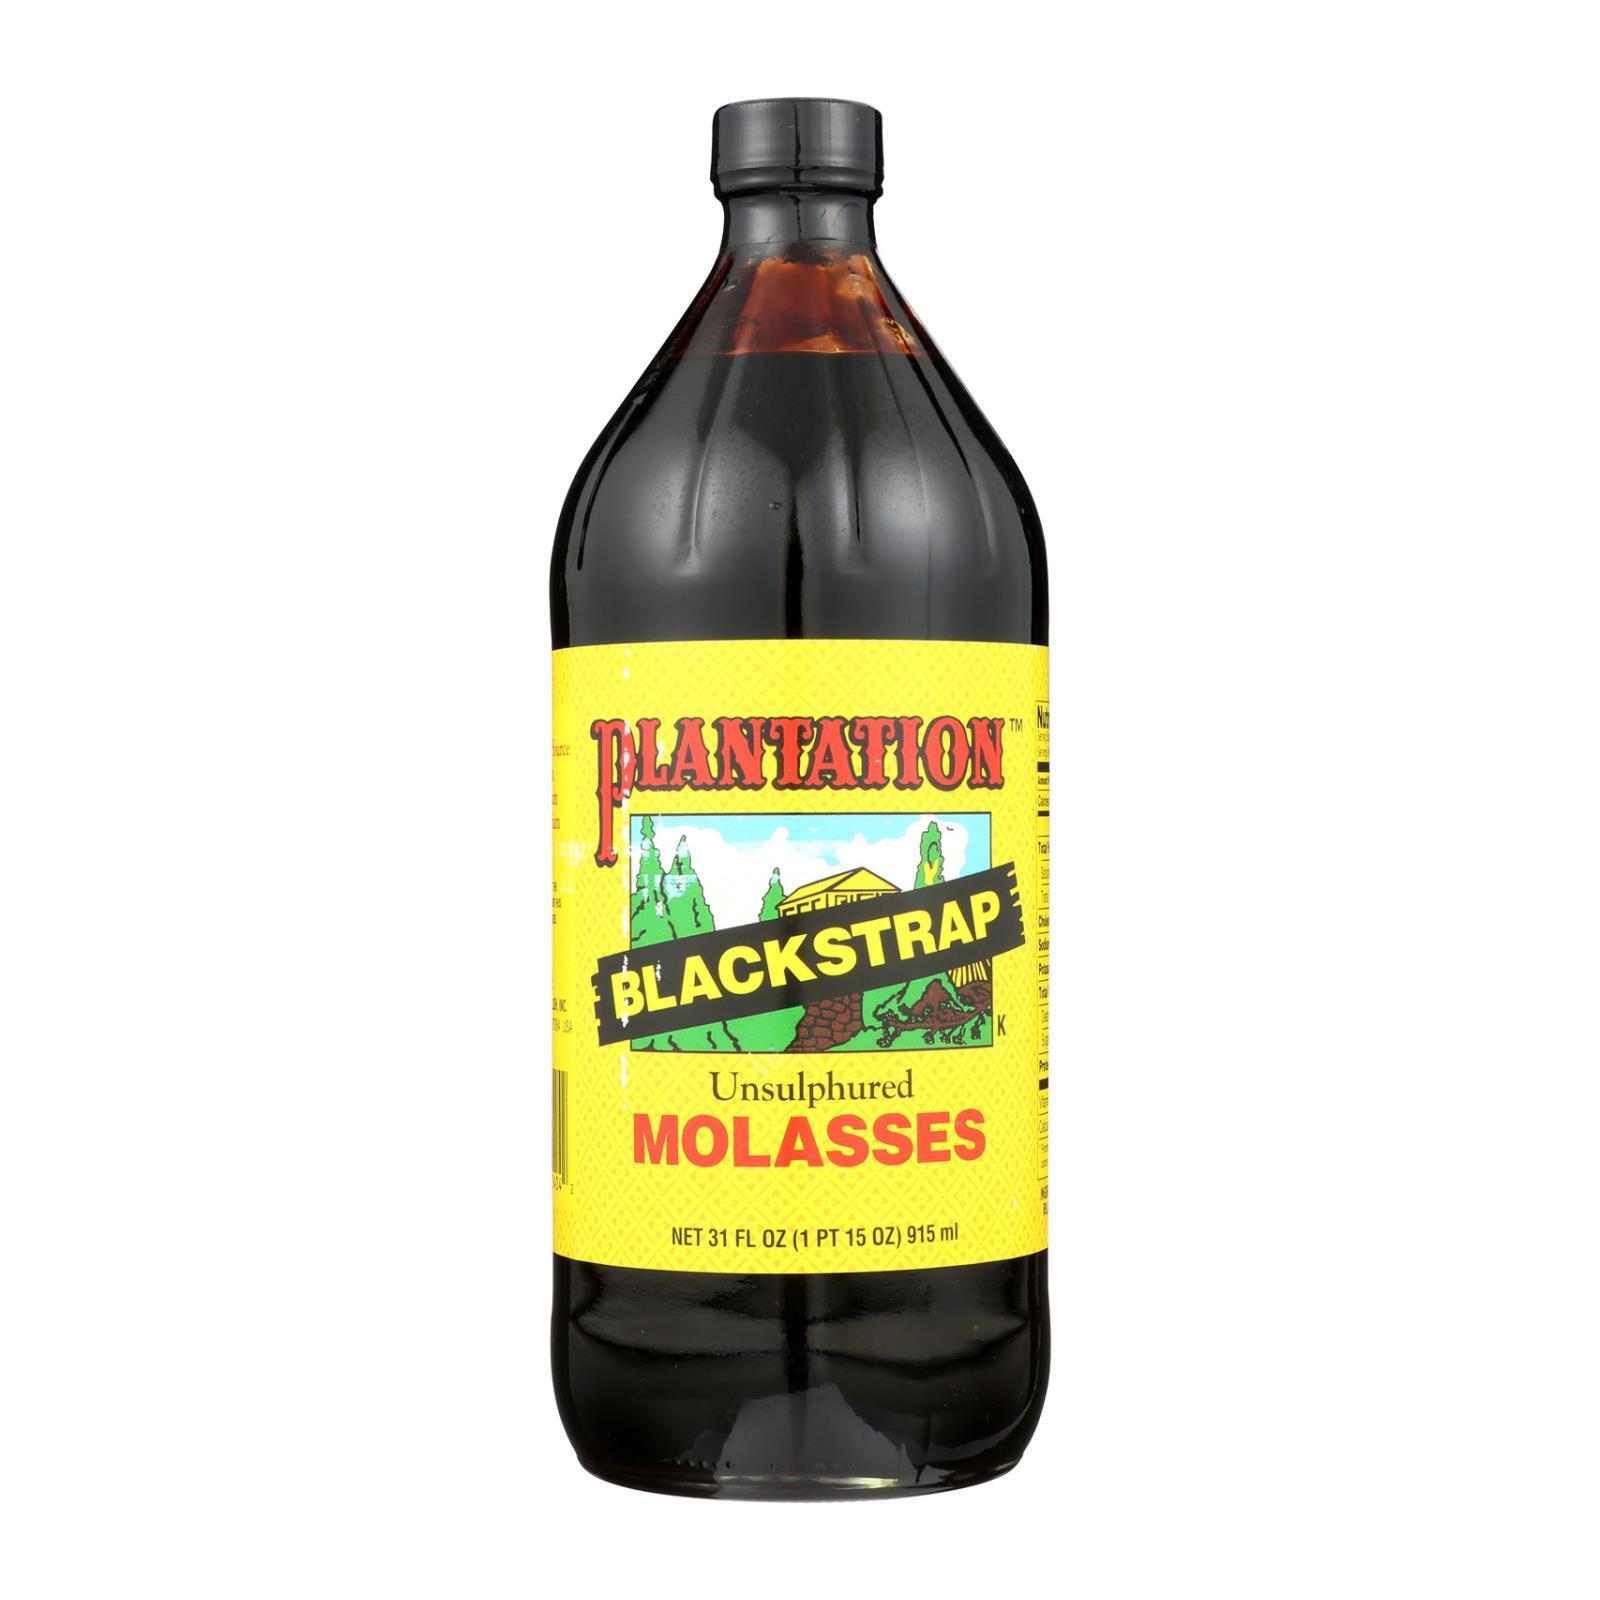 Plantation Blackstrap Molasses Syrup - Unsulphured - Case of 12 - 31 Fl oz.